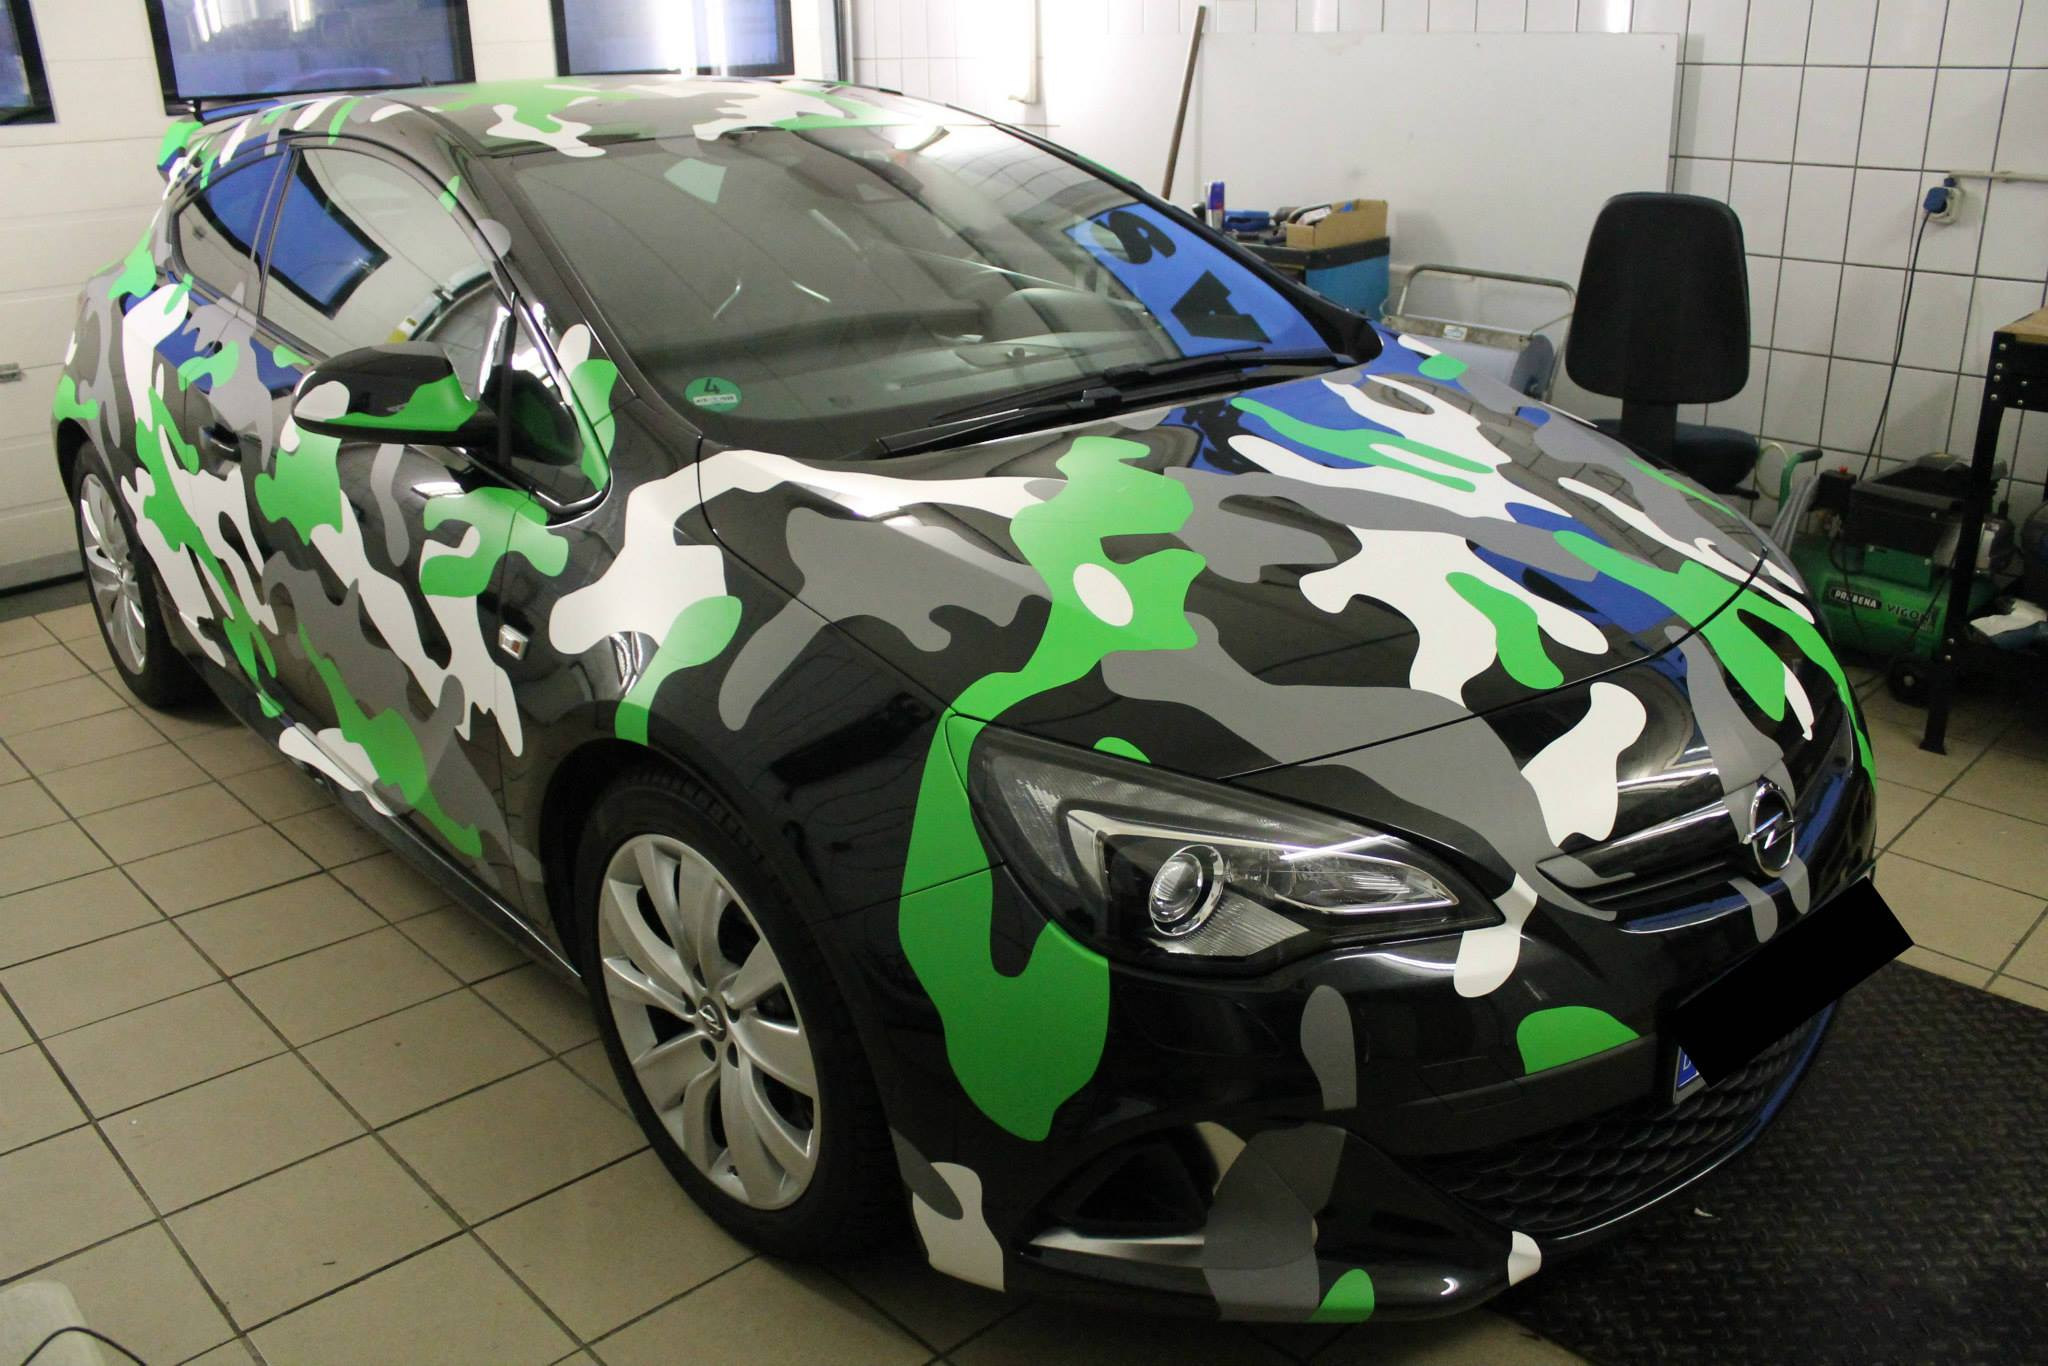 Opel Astra Opc In Camo Wrap Looks Tough